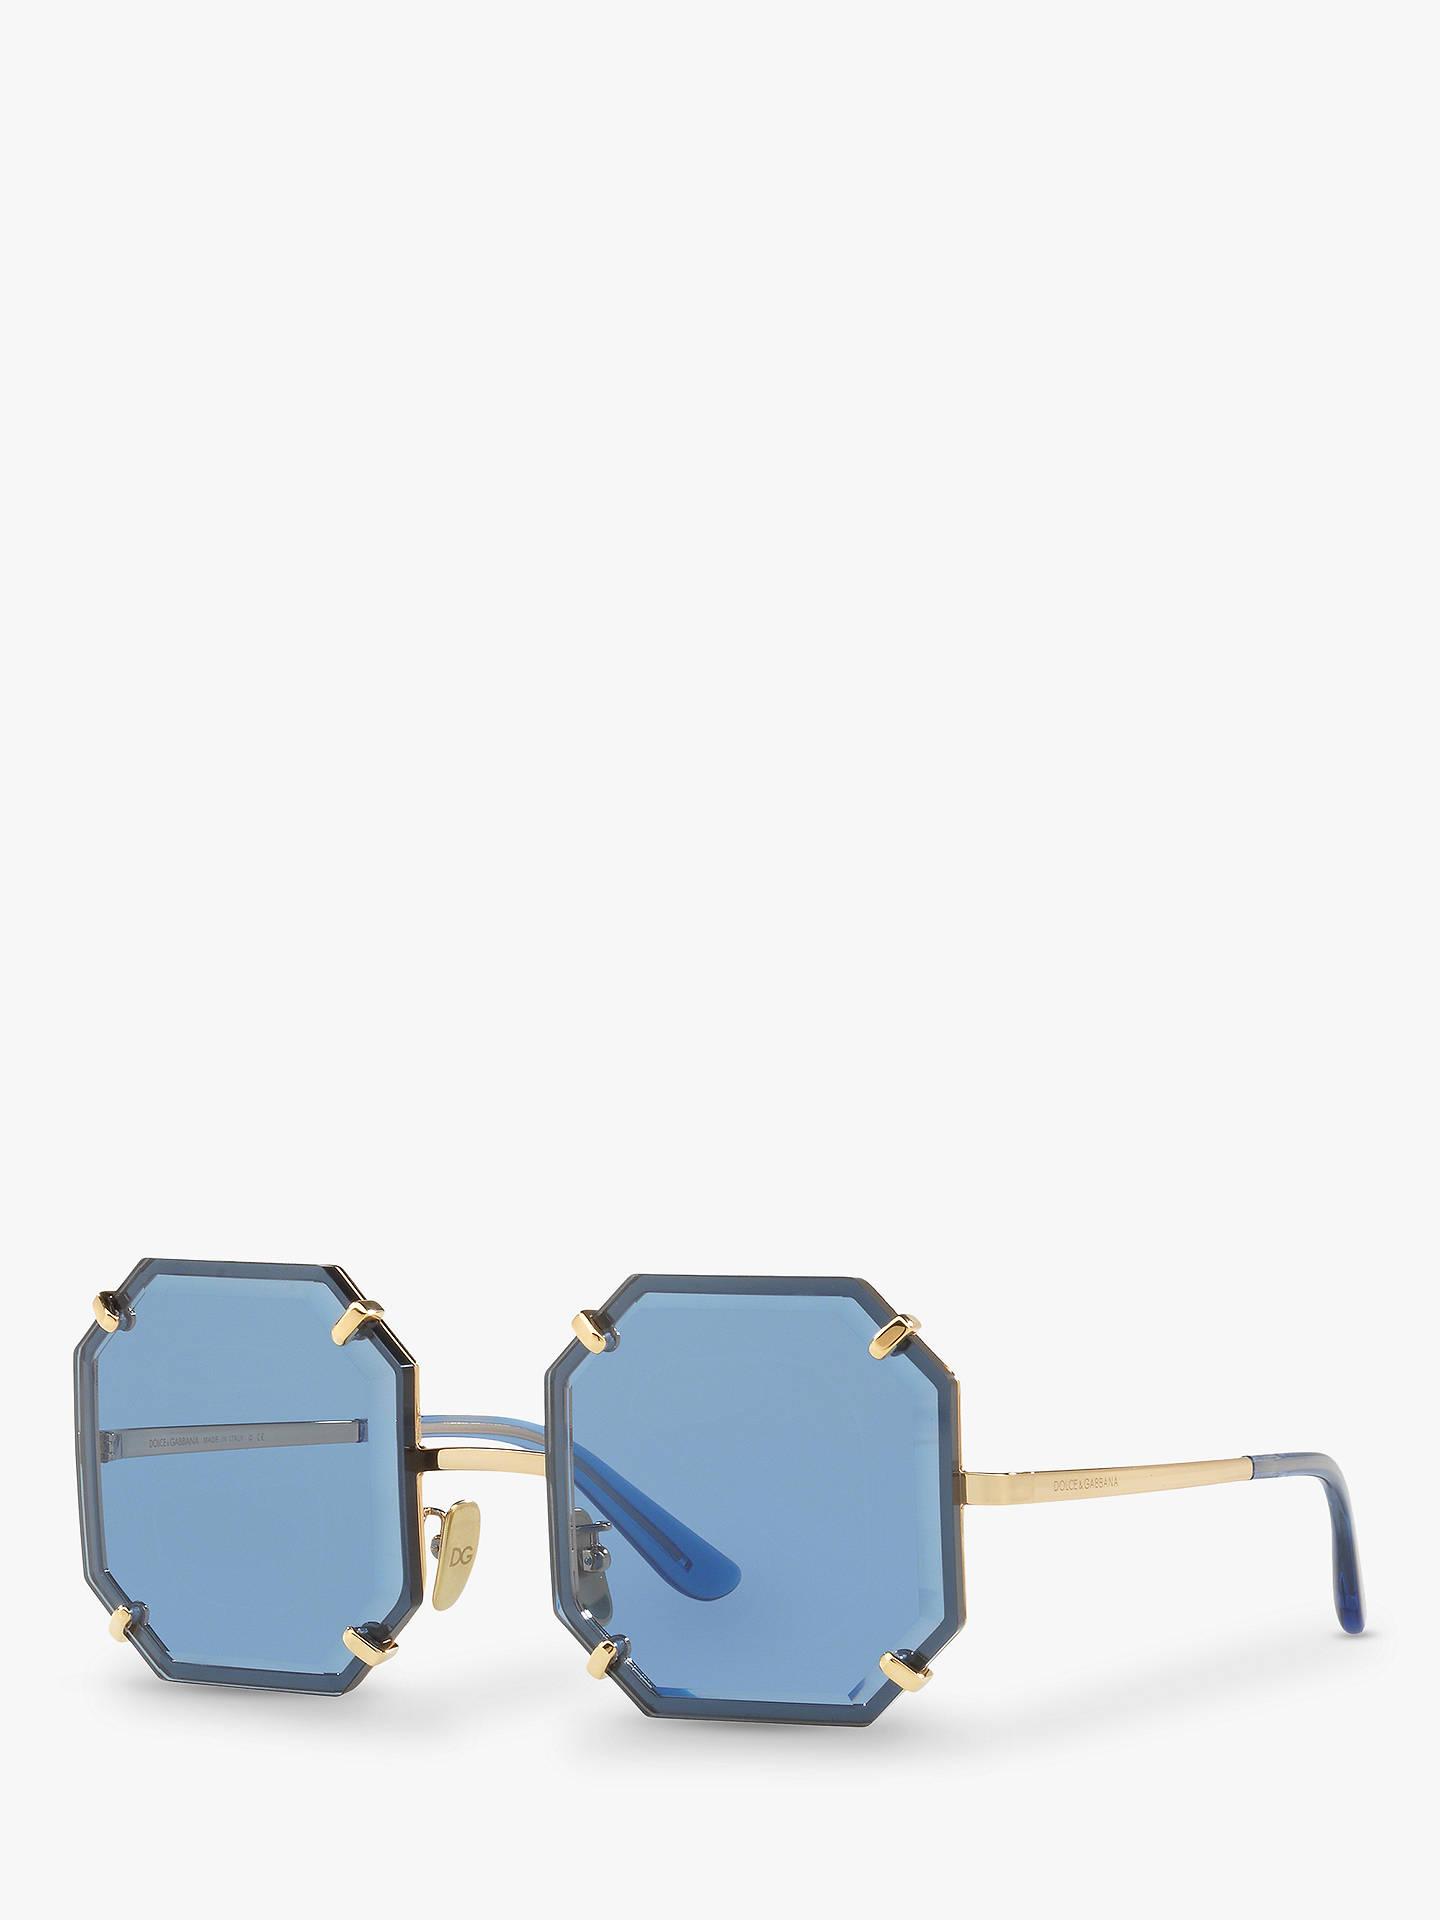 d5af2f7e49bf Buy Dolce   Gabbana DG2216 Women s Octagonal Sunglasses